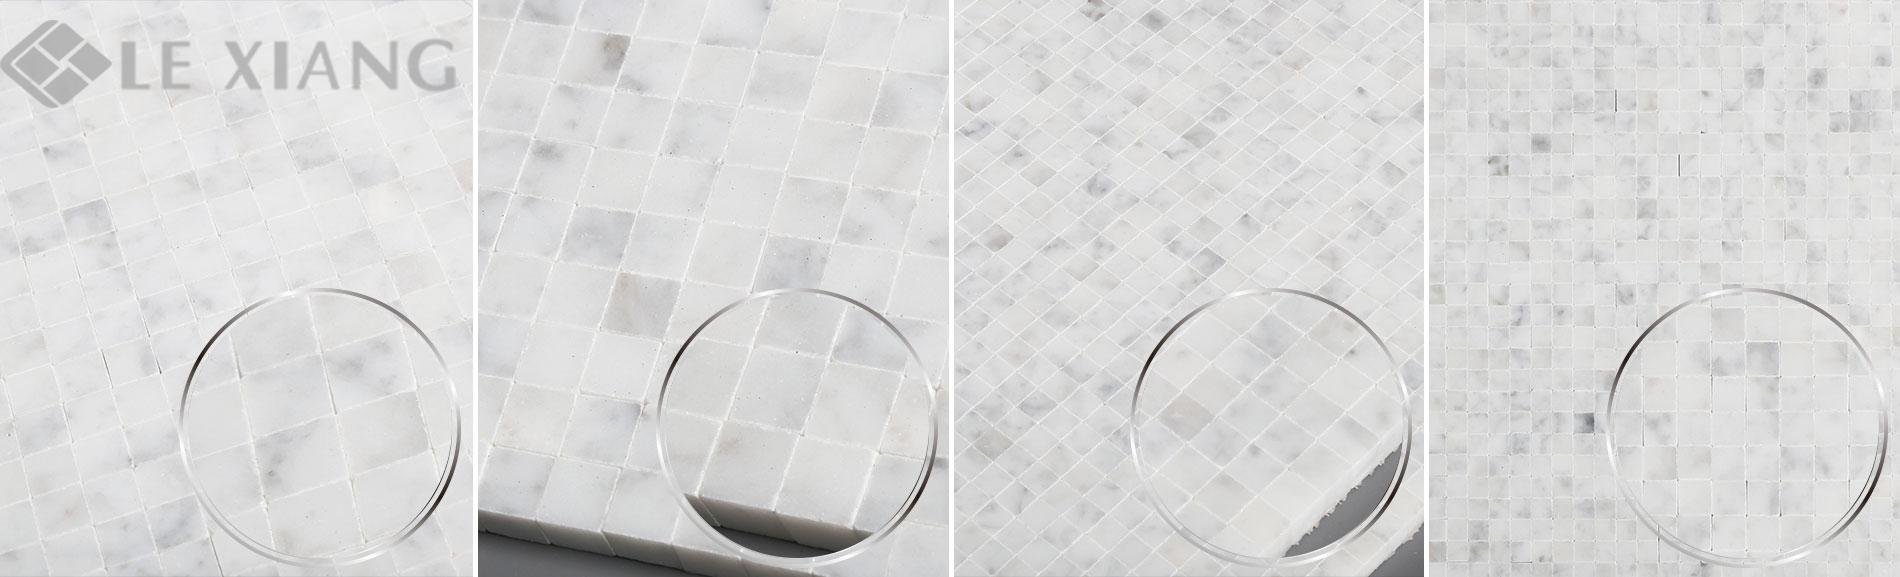 Square-Mable-Mosaic-Tiles-For-Kitchen-Backsplash-15